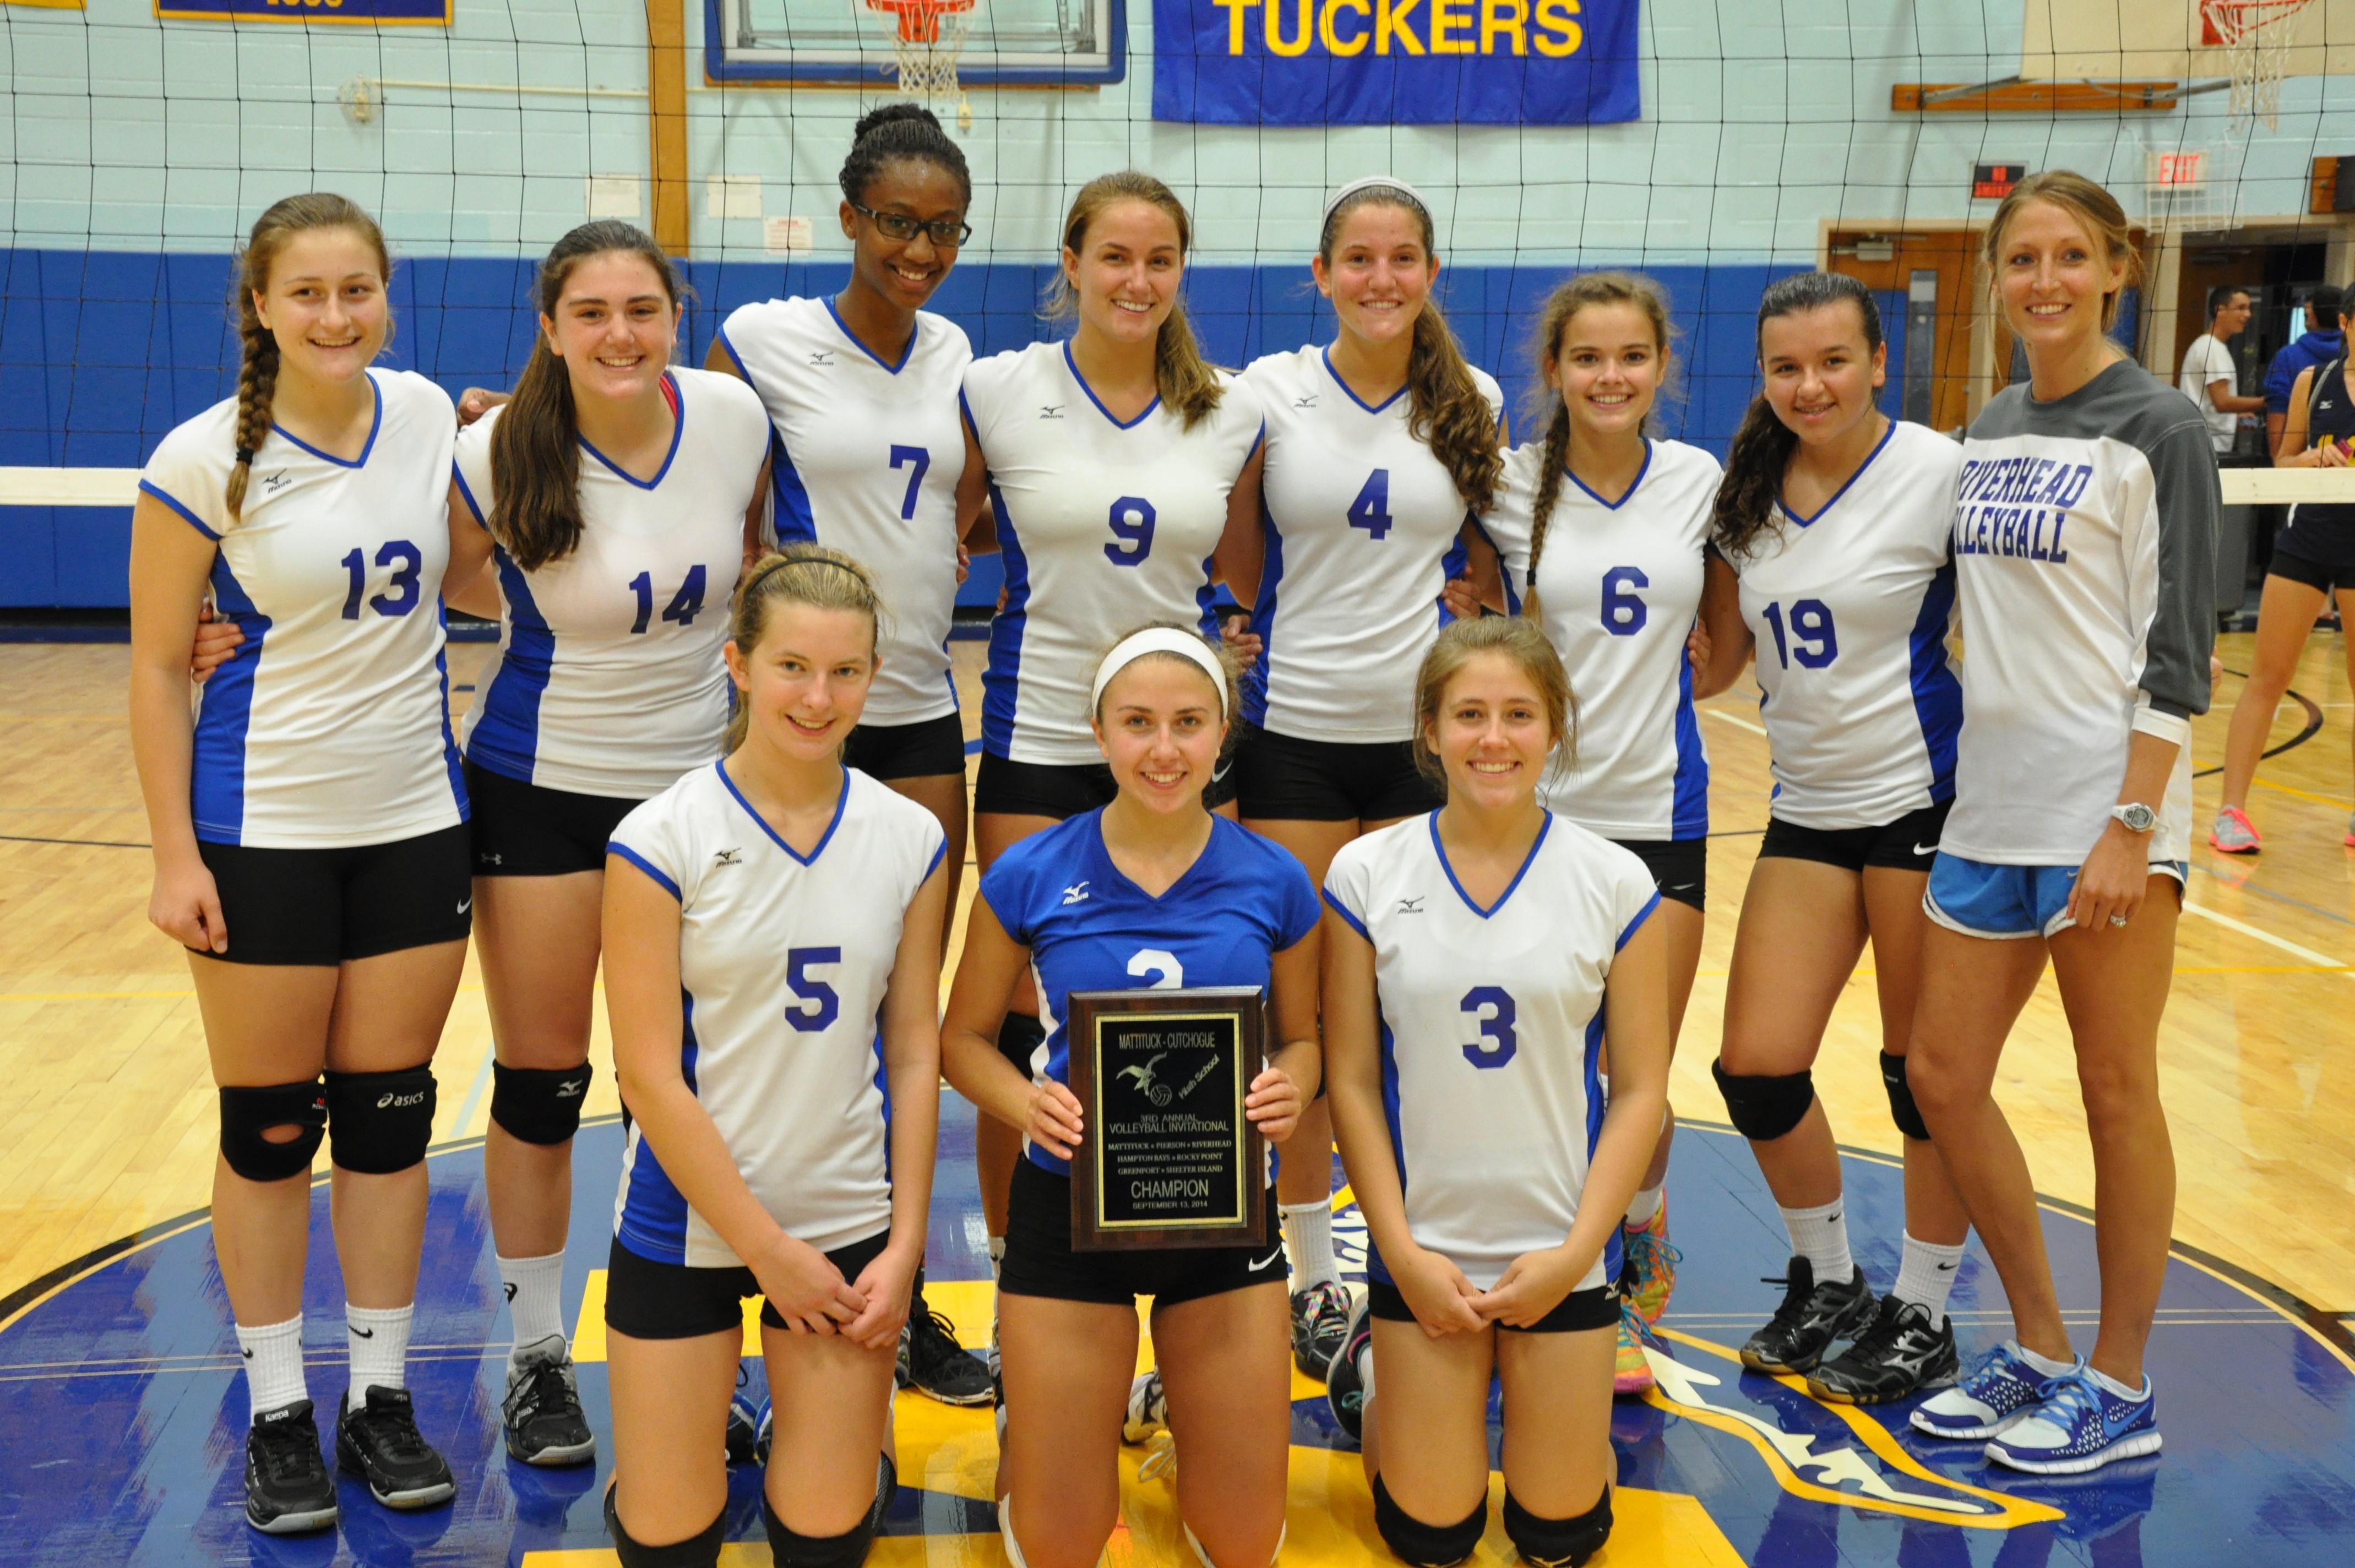 Riverhead girls 39 volleyball team wins mattituck volleyball for Riverhead bay motors service